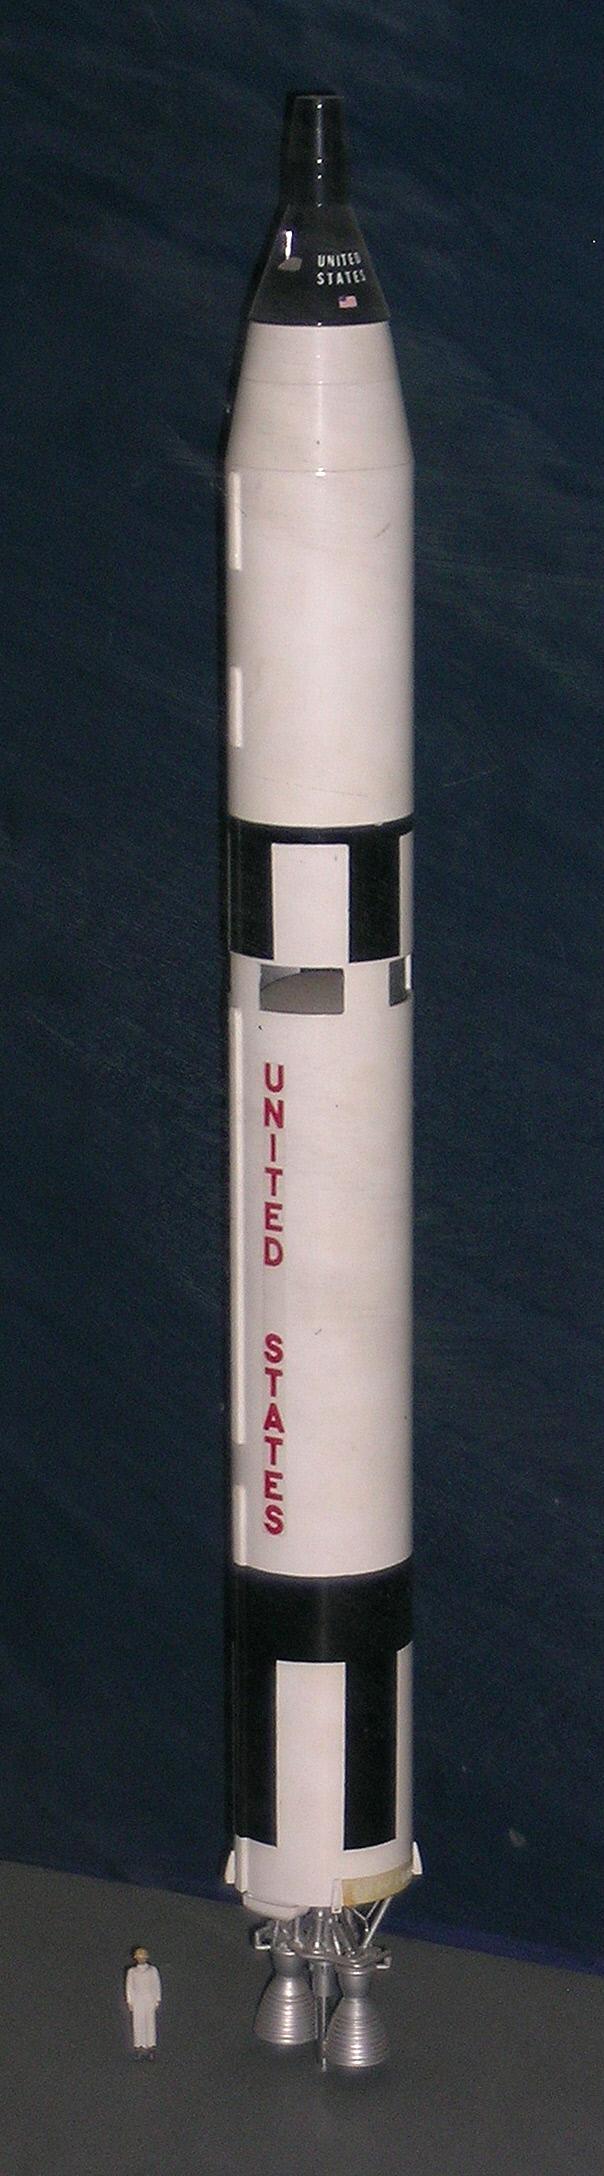 Image of : Model, Rocket, Gemini Titan II, 1:48